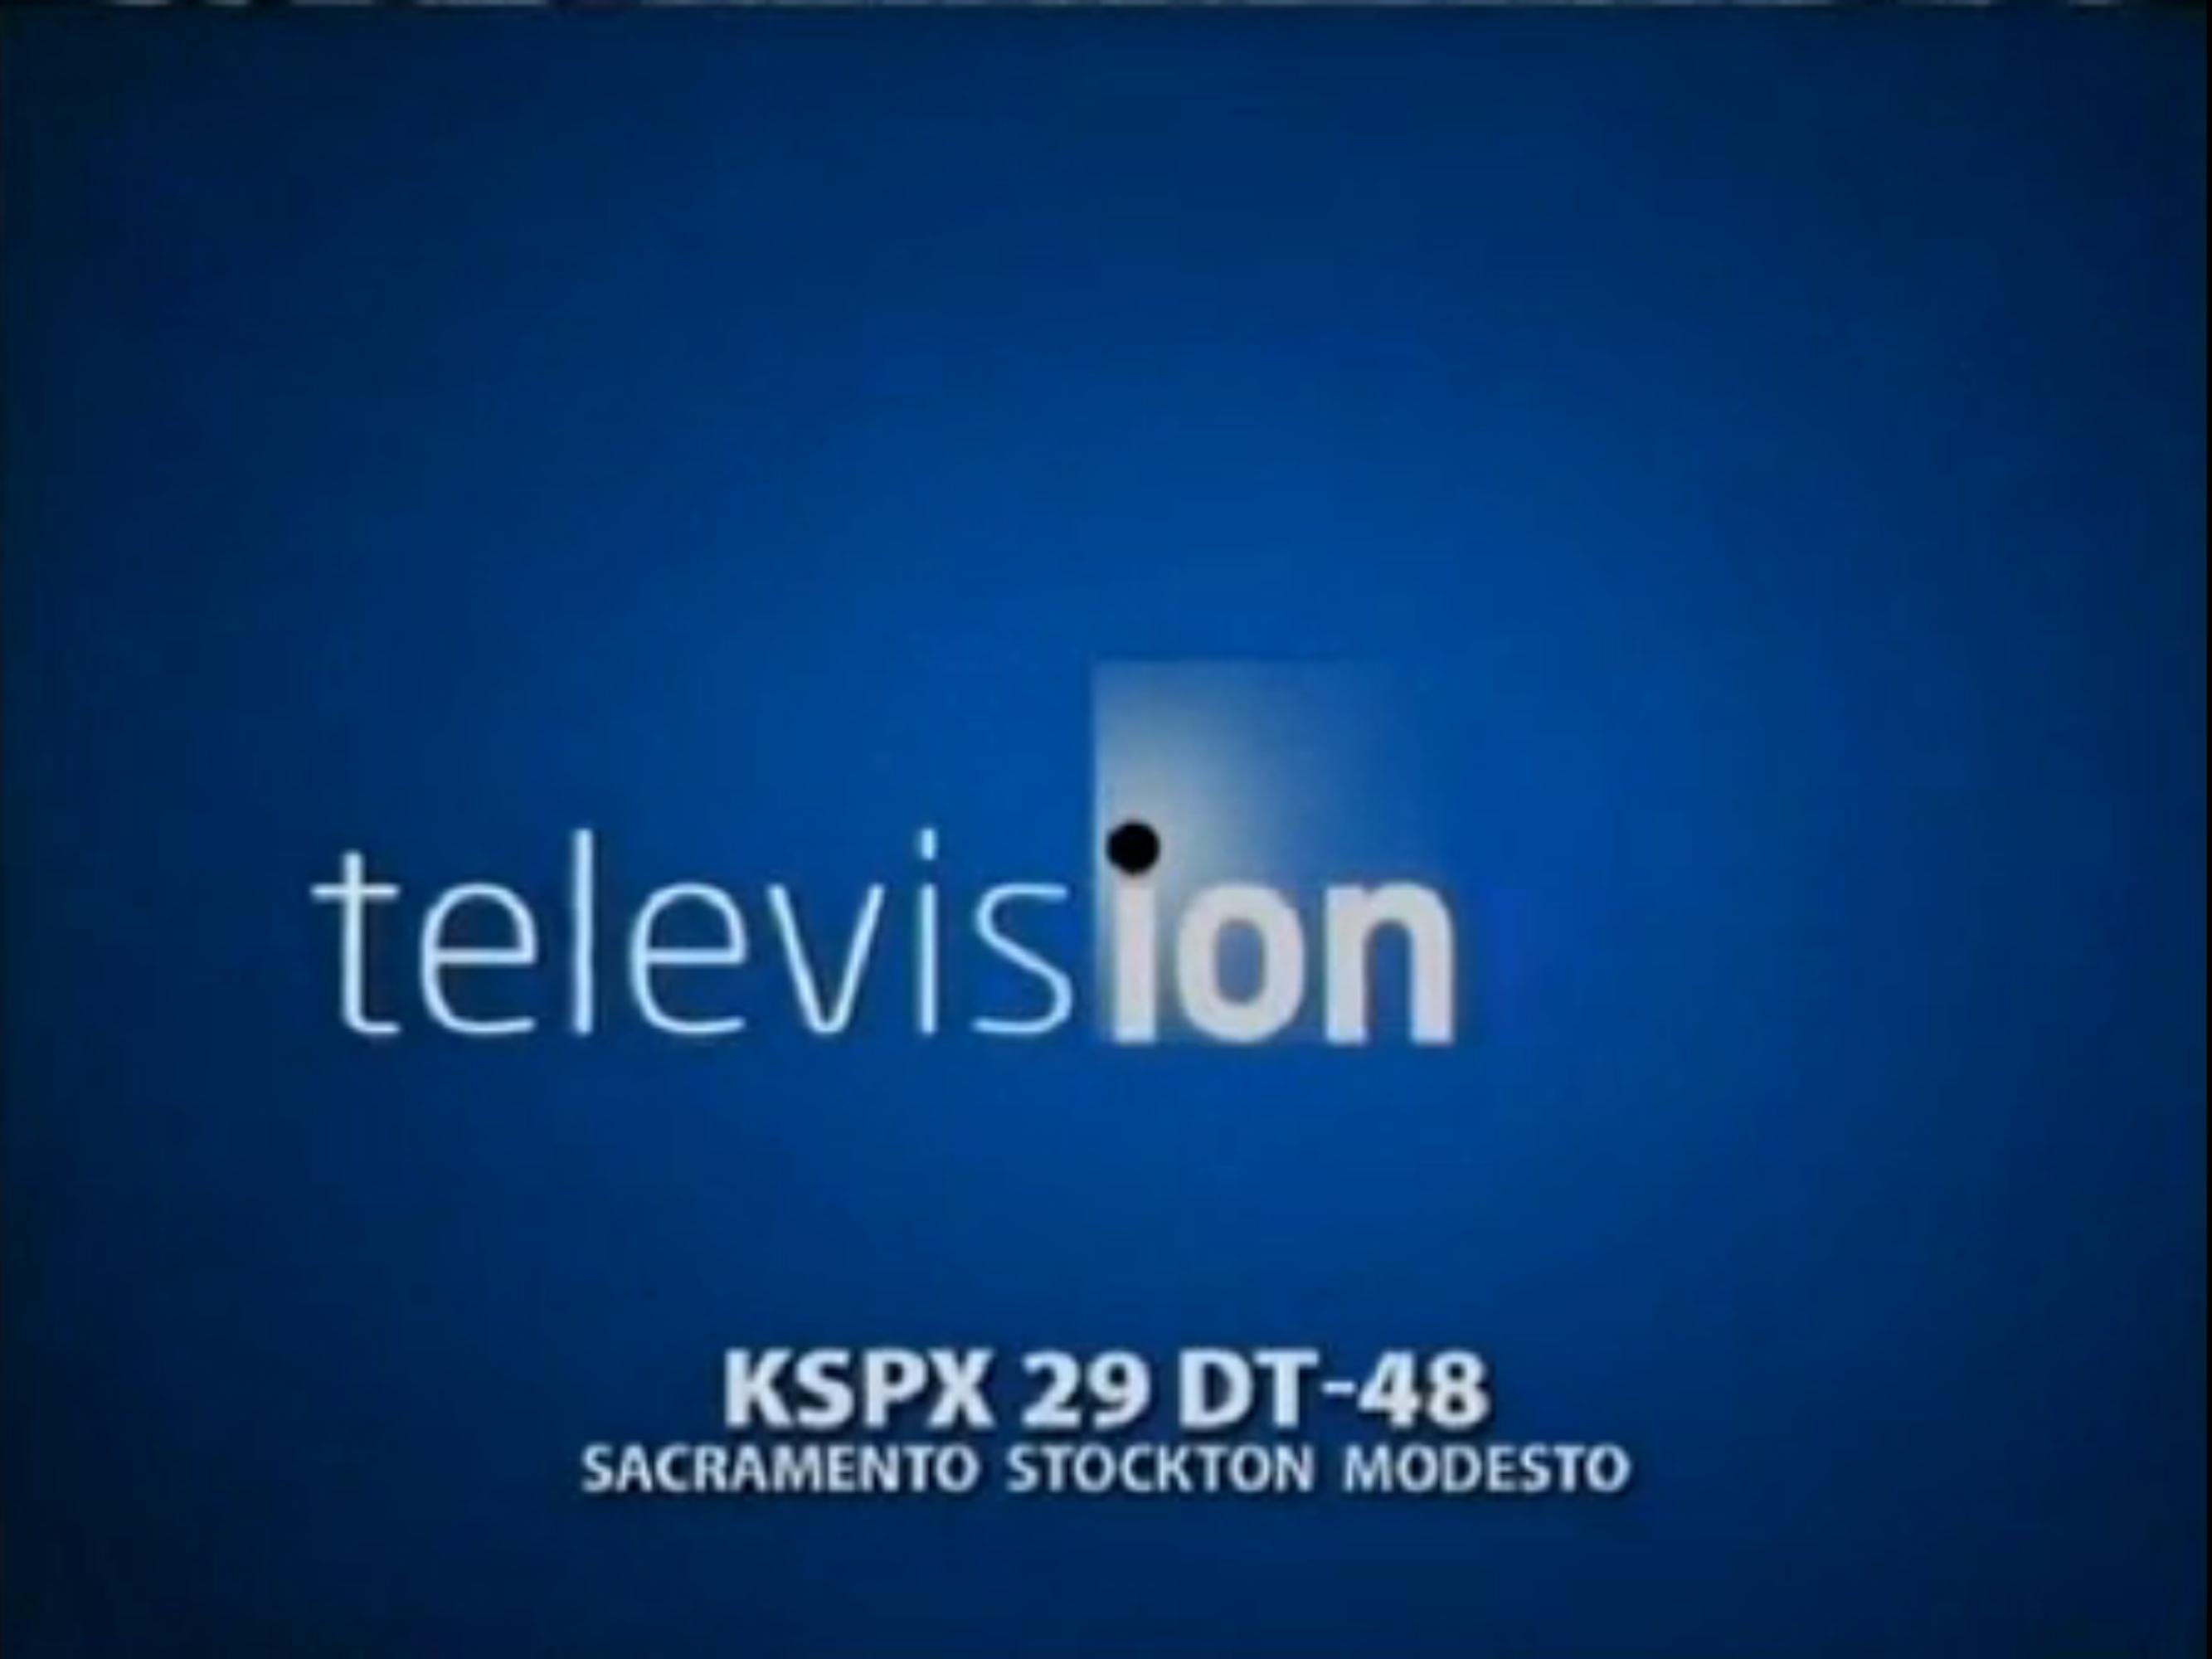 Kpxd Tv Images - Reverse Search